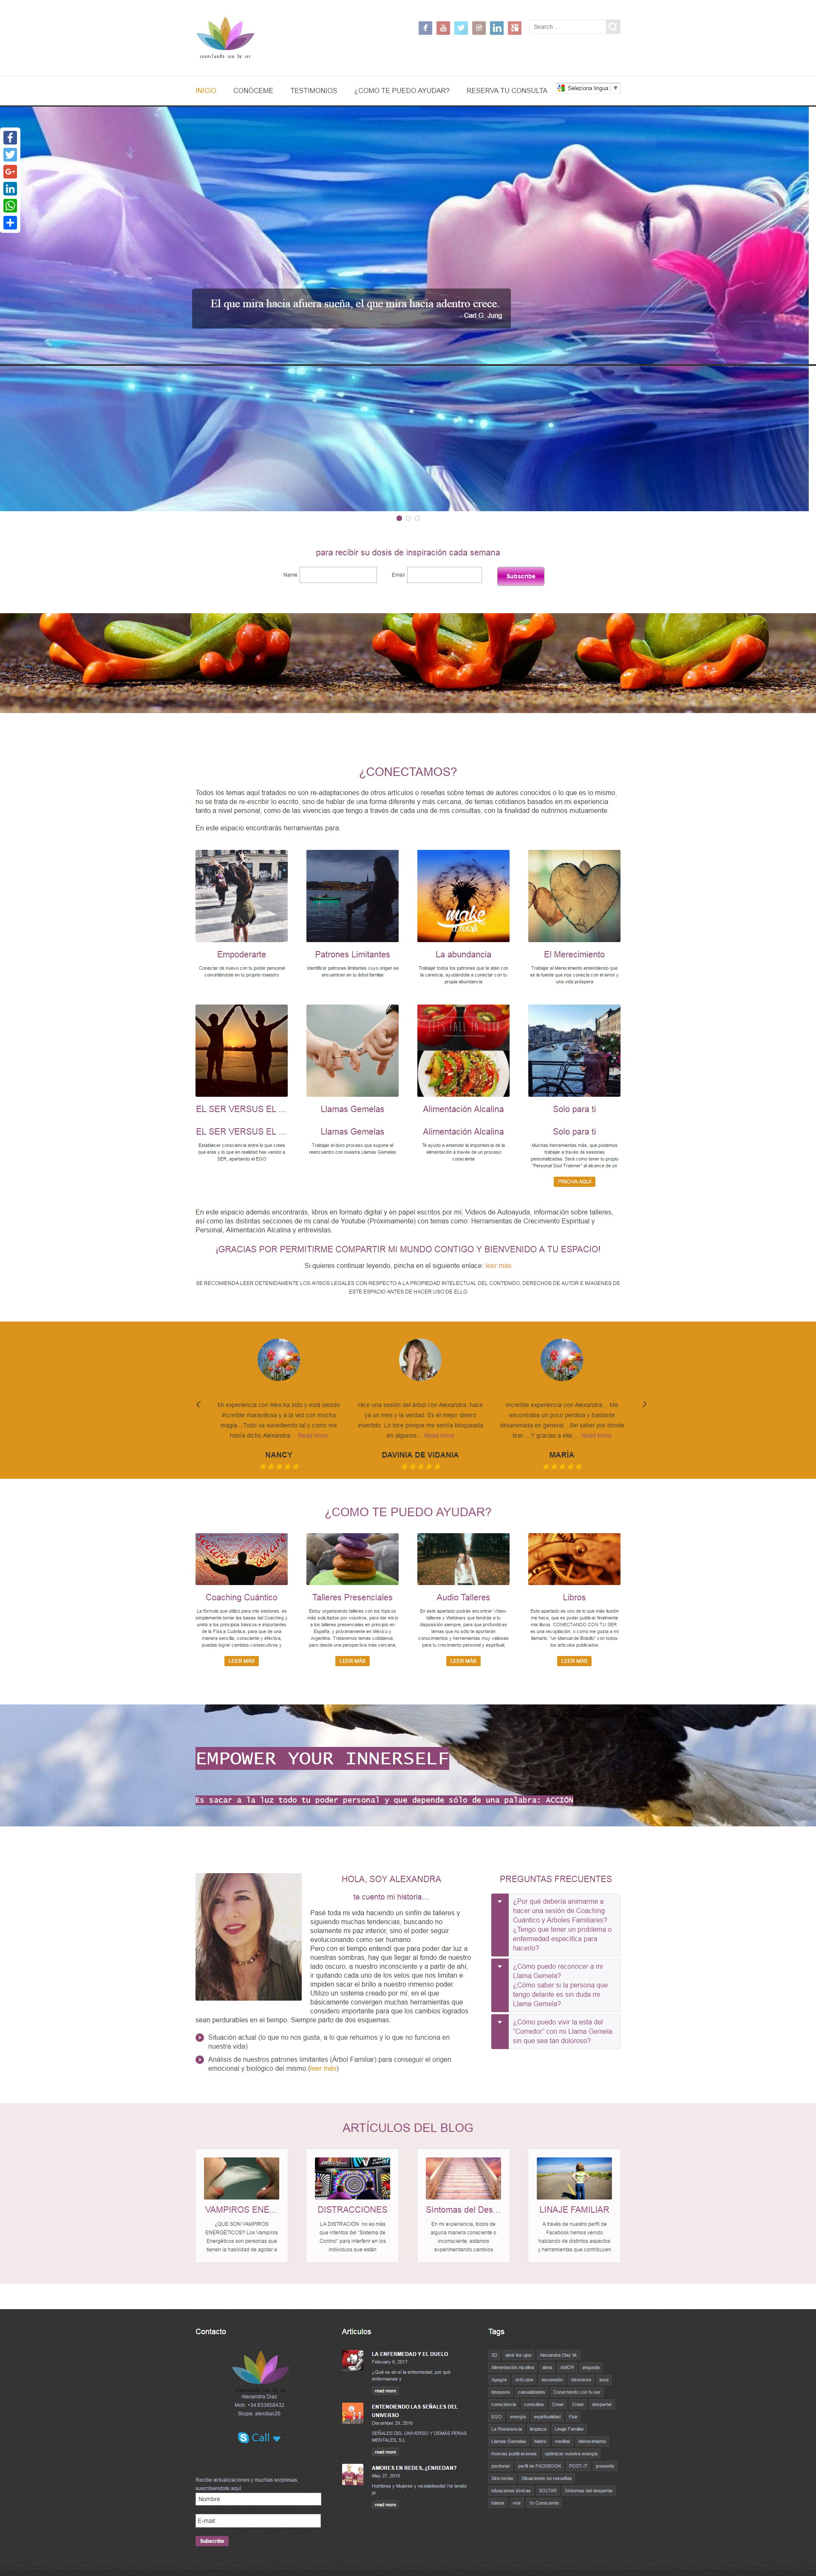 www.conectandocontuser.com